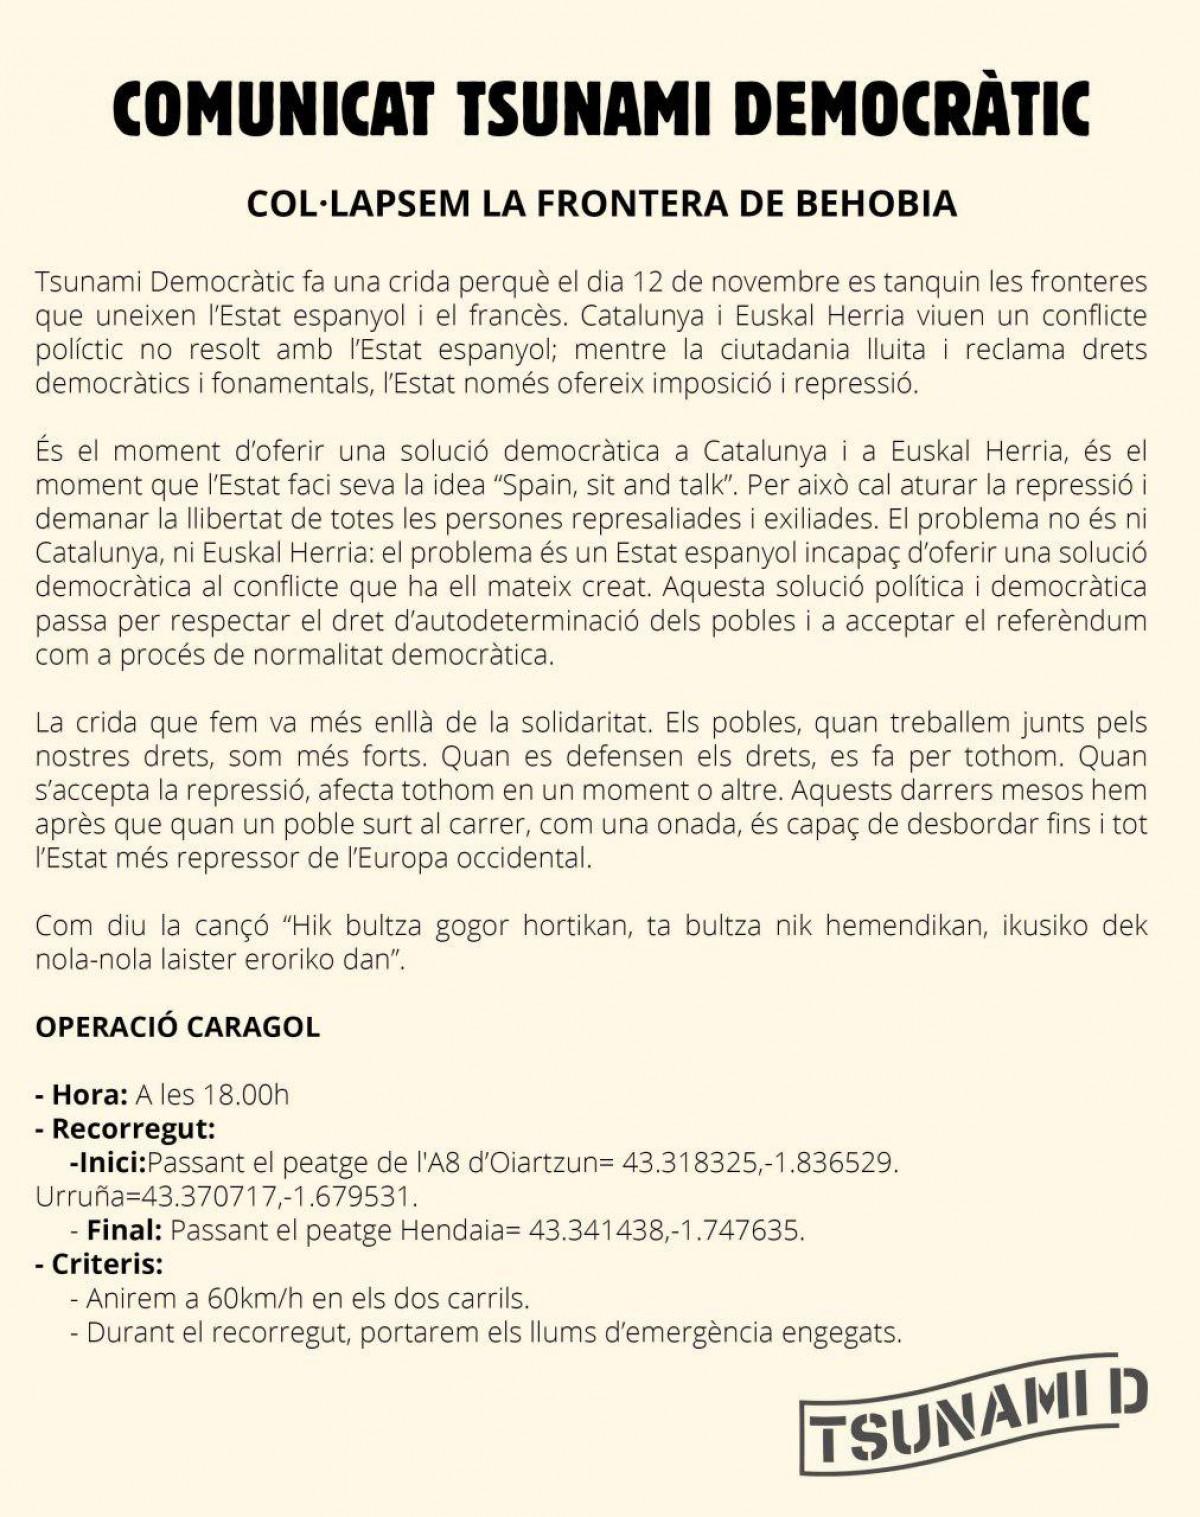 Retrusés: Antologia de la Chirigota Prusesista - Página 7 1200_1573553545photo_2019-11-12_11-00-21